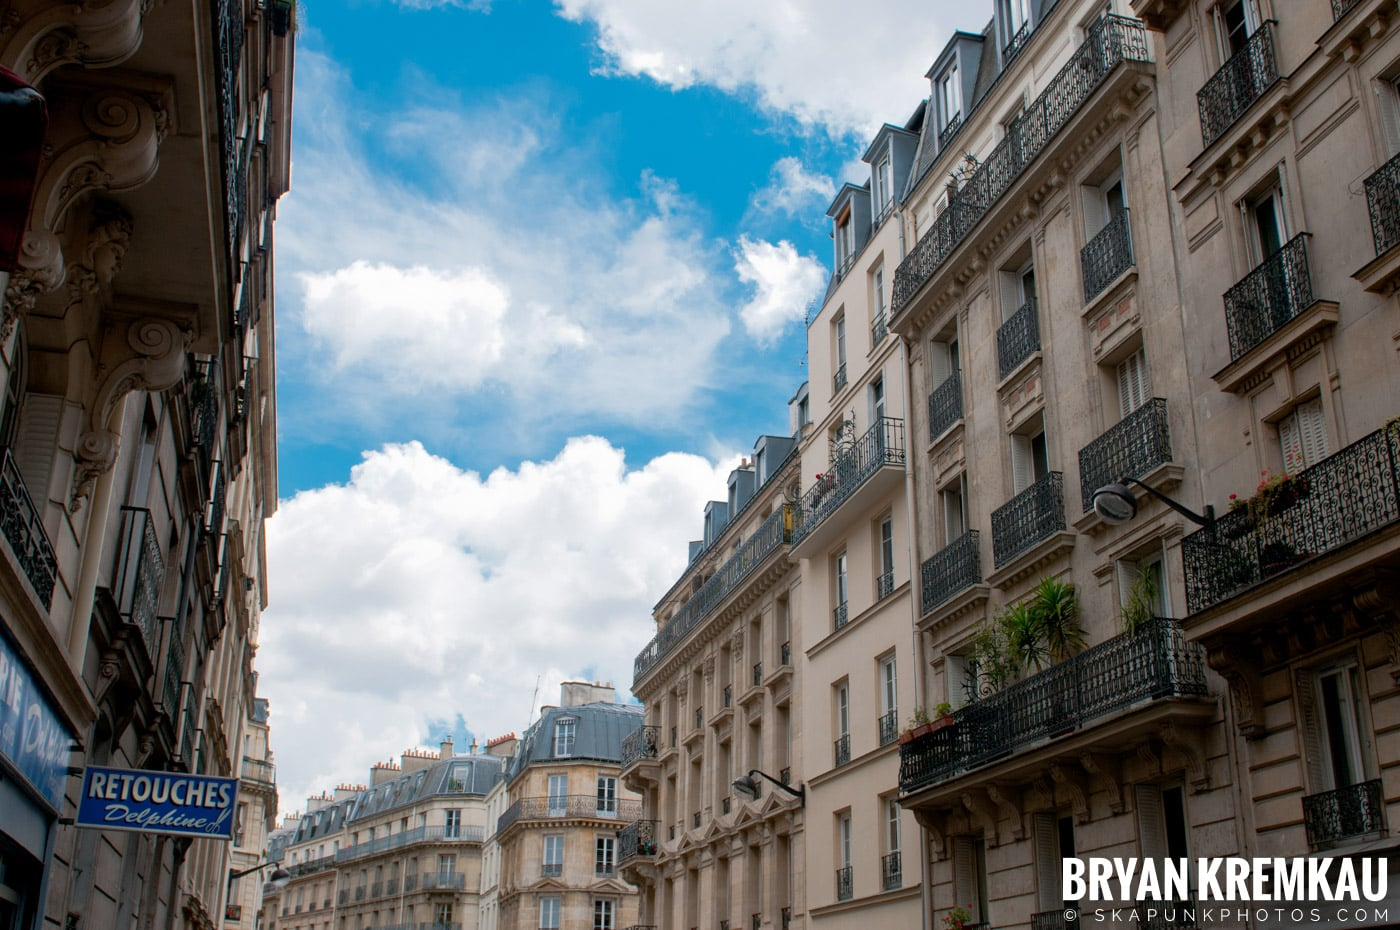 Paris, France Honeymoon - Day 8 - 7.25.11 (24)